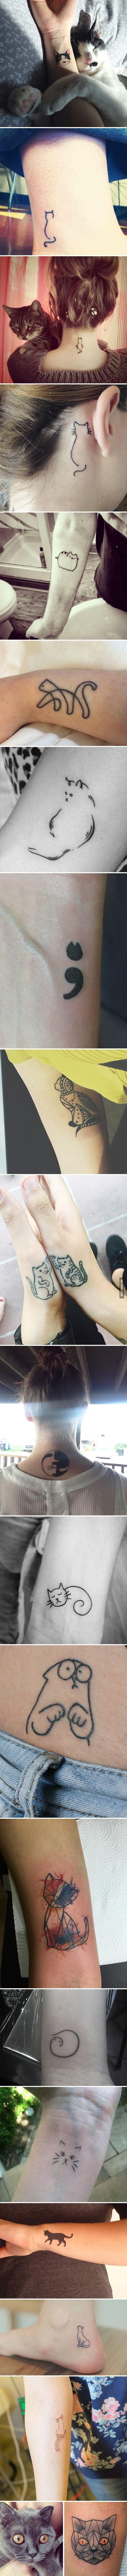 Cool little tattoo ideas cooltop tiny tattoo idea   minimalistic